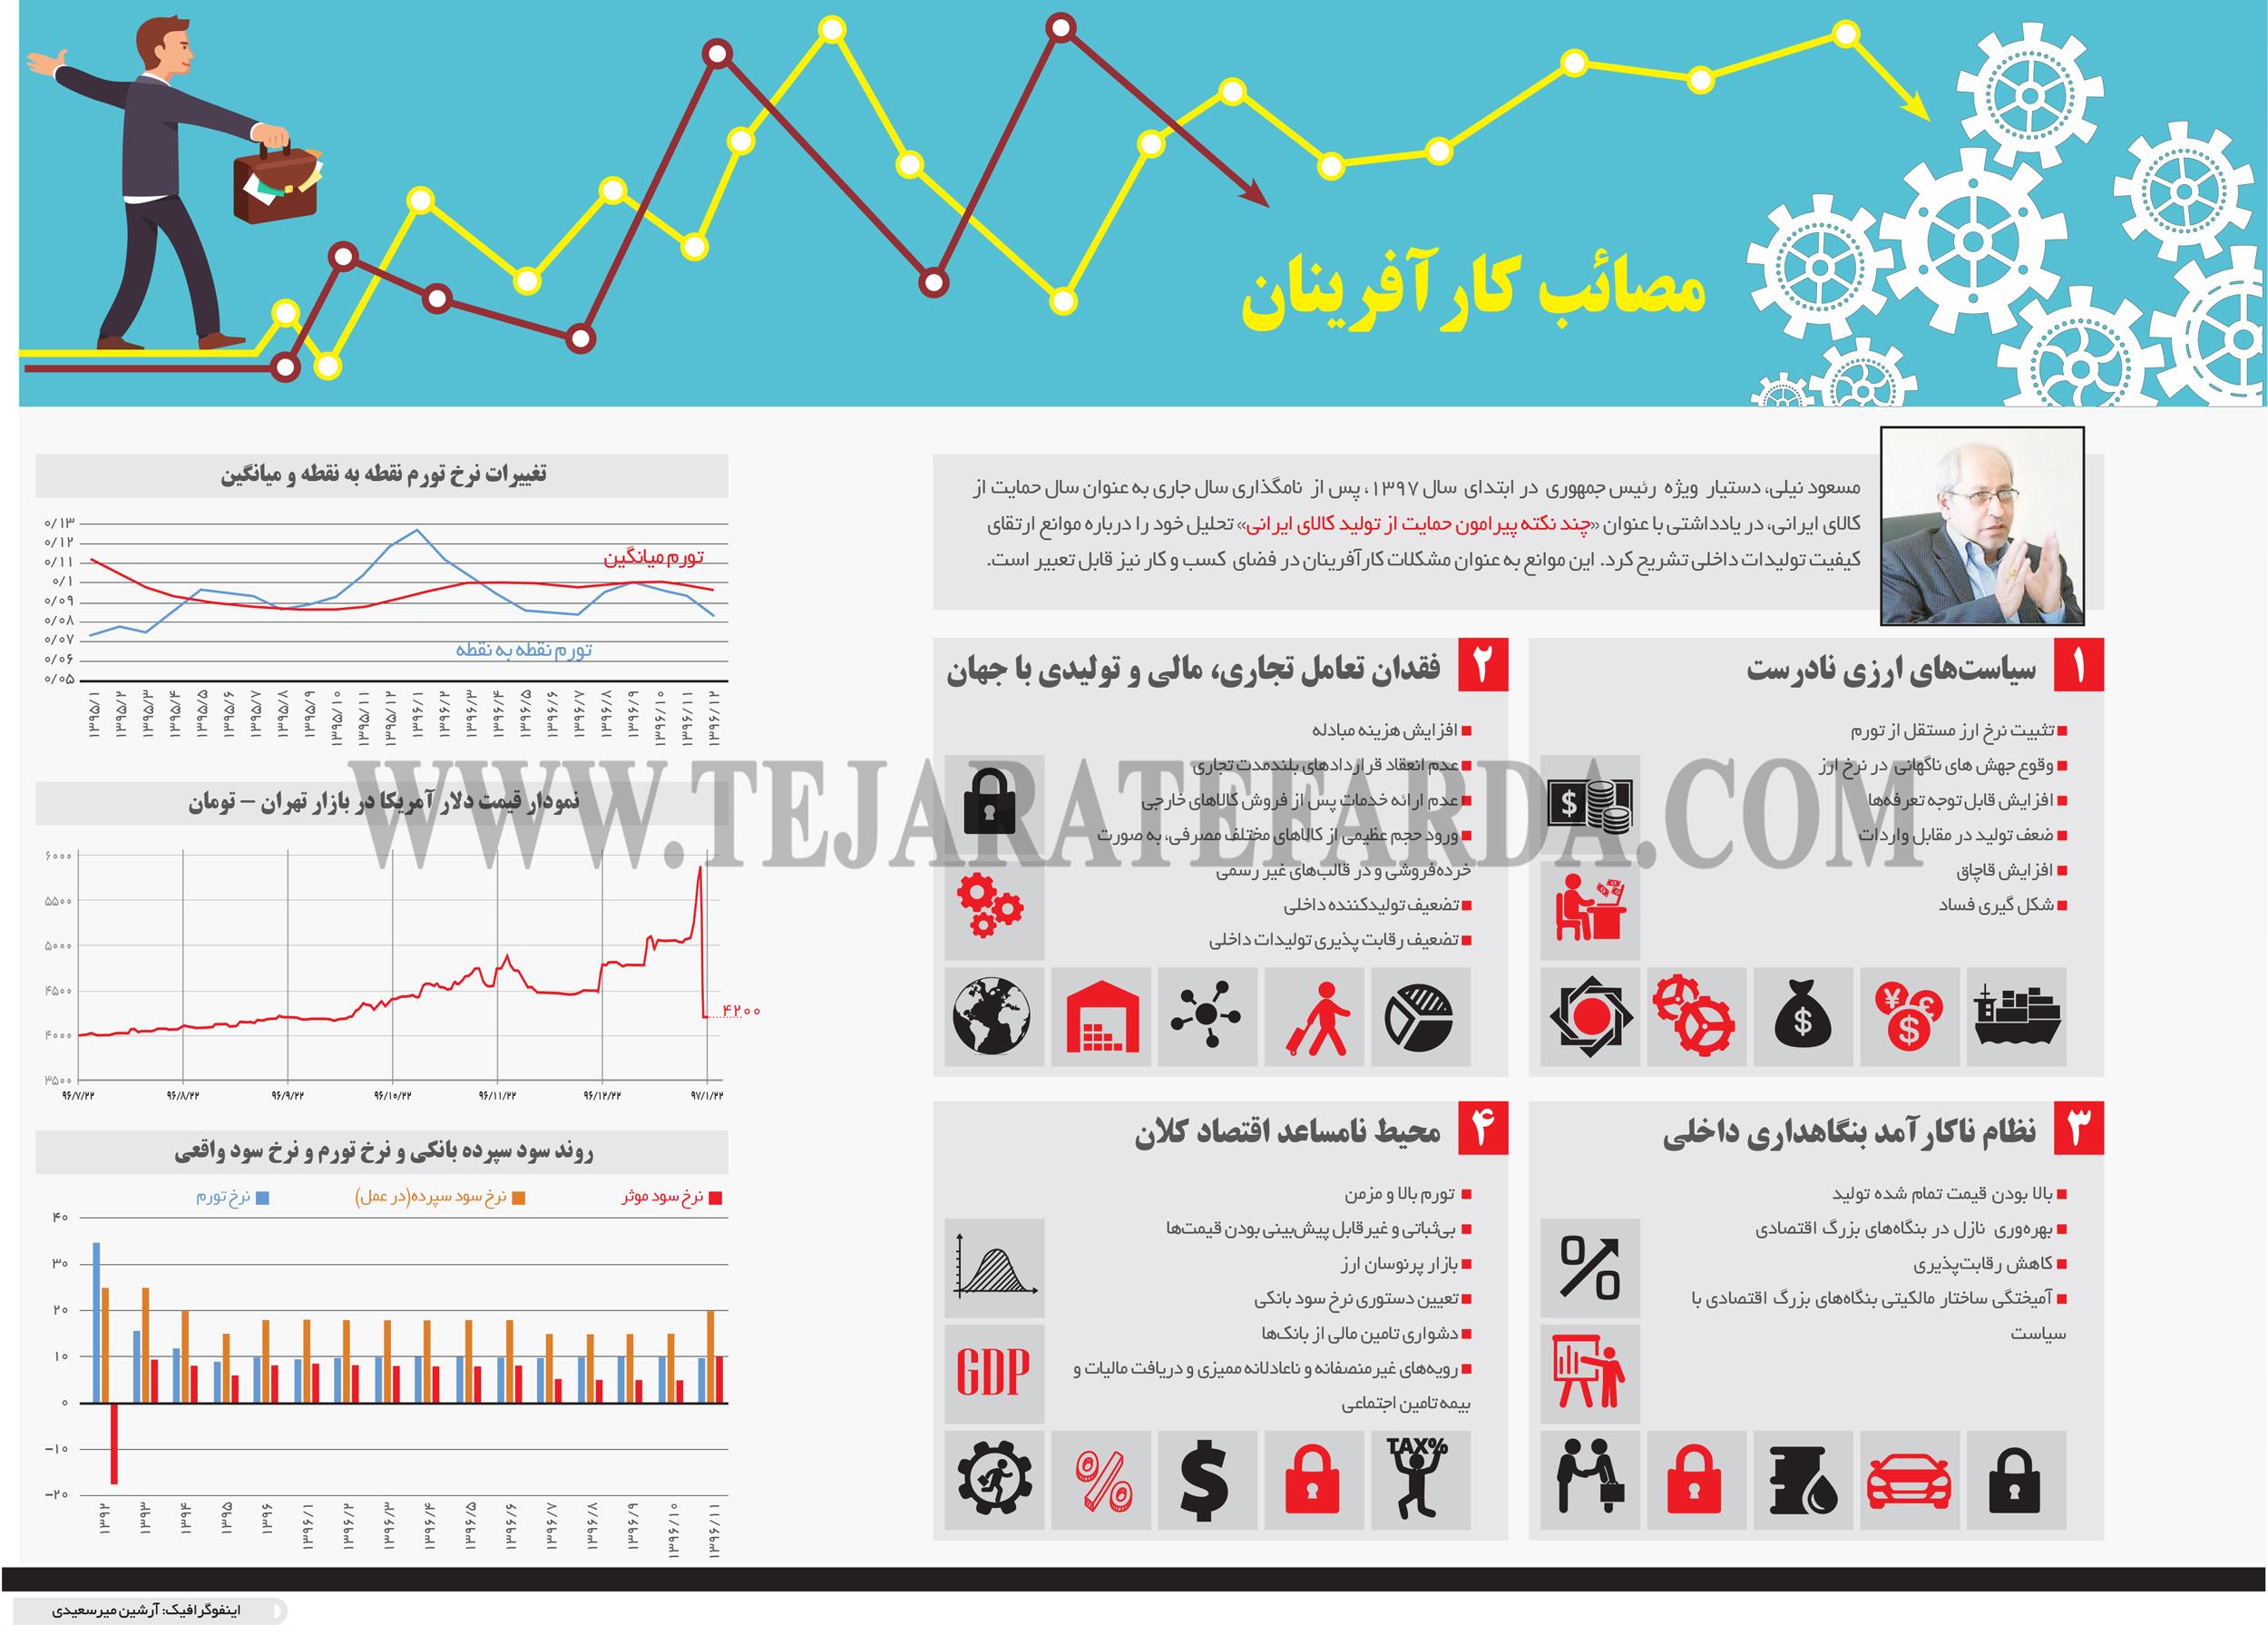 تجارت فردا- اینفوگرافیک- مصائب کارآفرینان